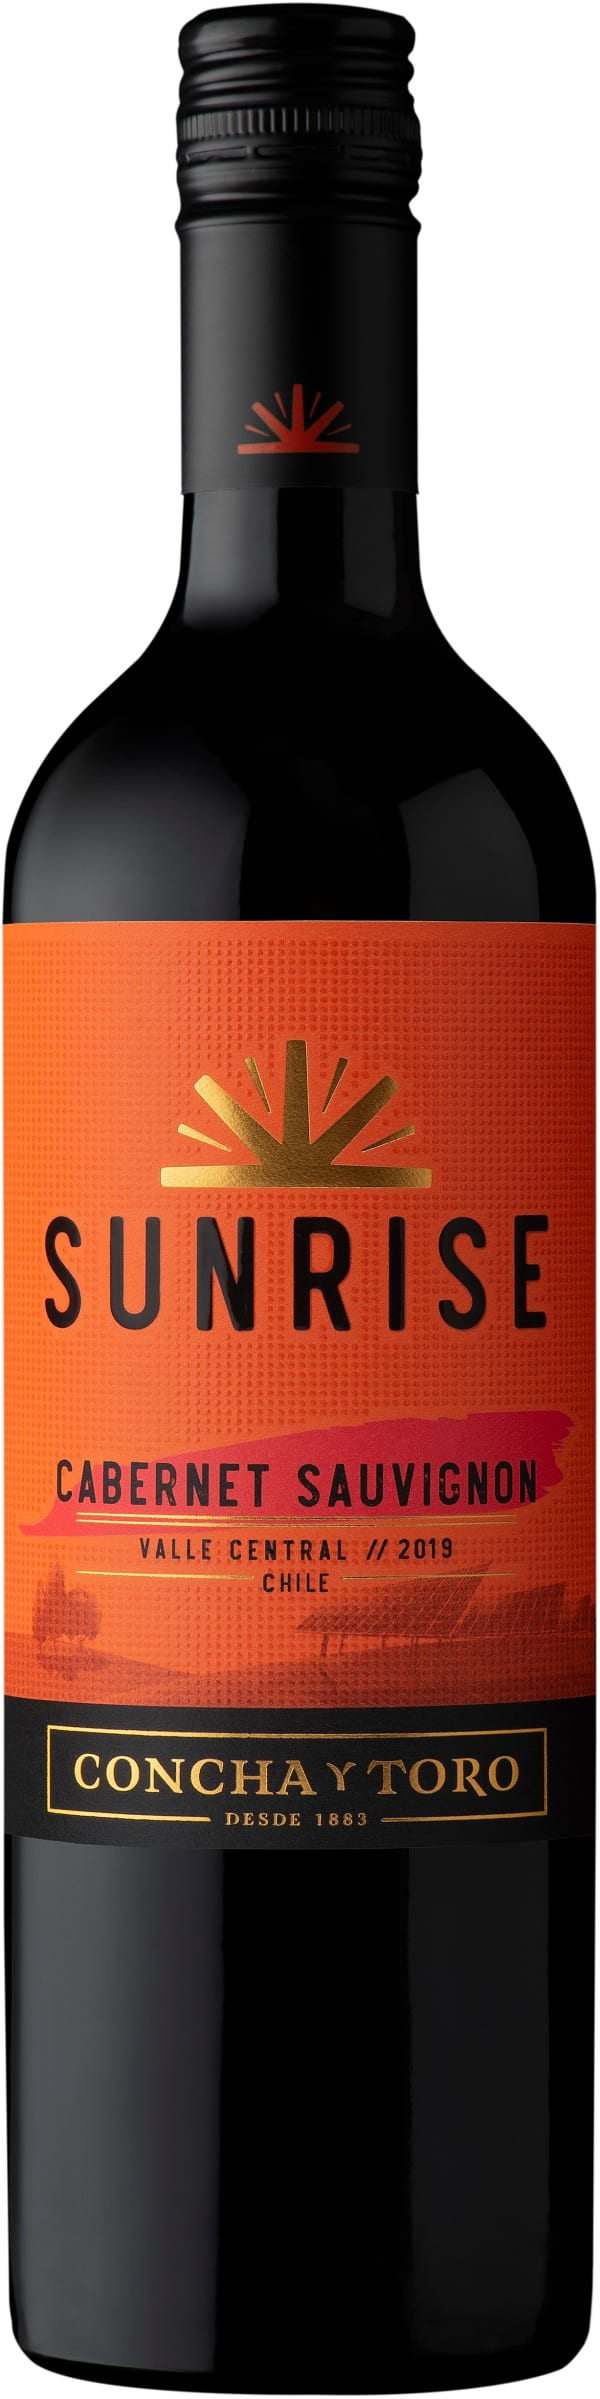 Sunrise Cabernet Sauvignon 2017